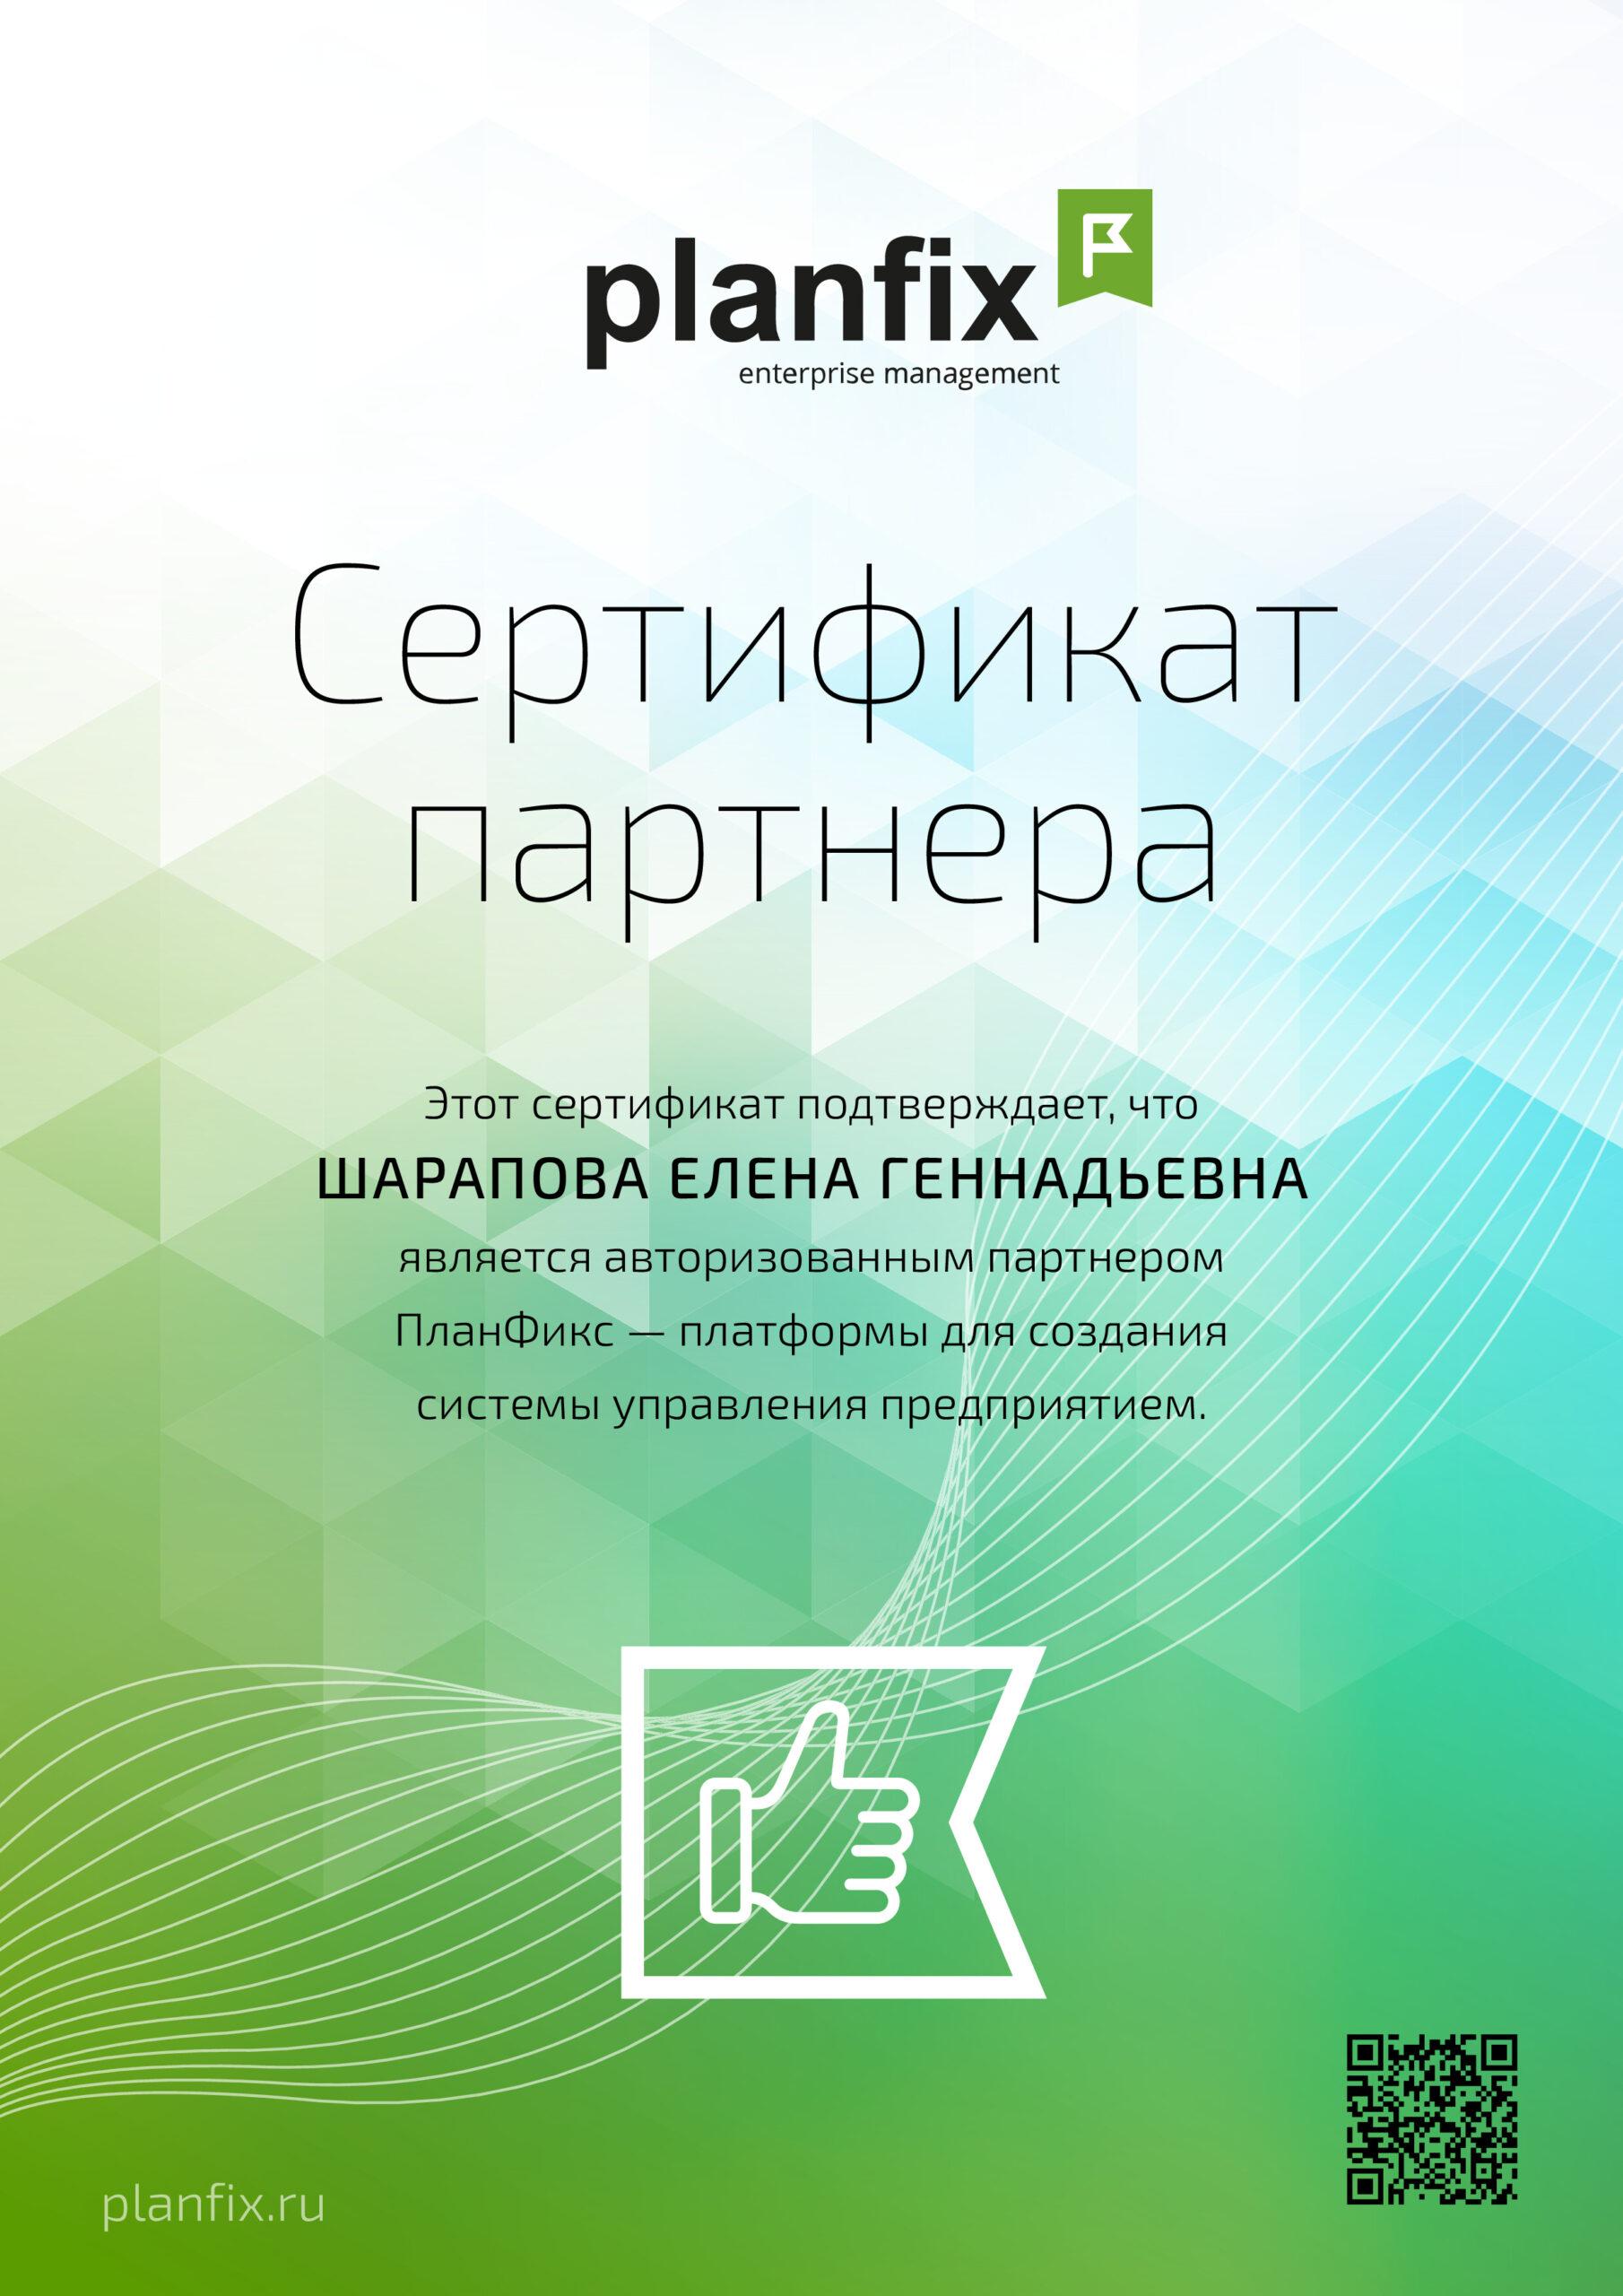 Партнерский сертификат ПланФикс - Шарапова Елена Геннадьевна